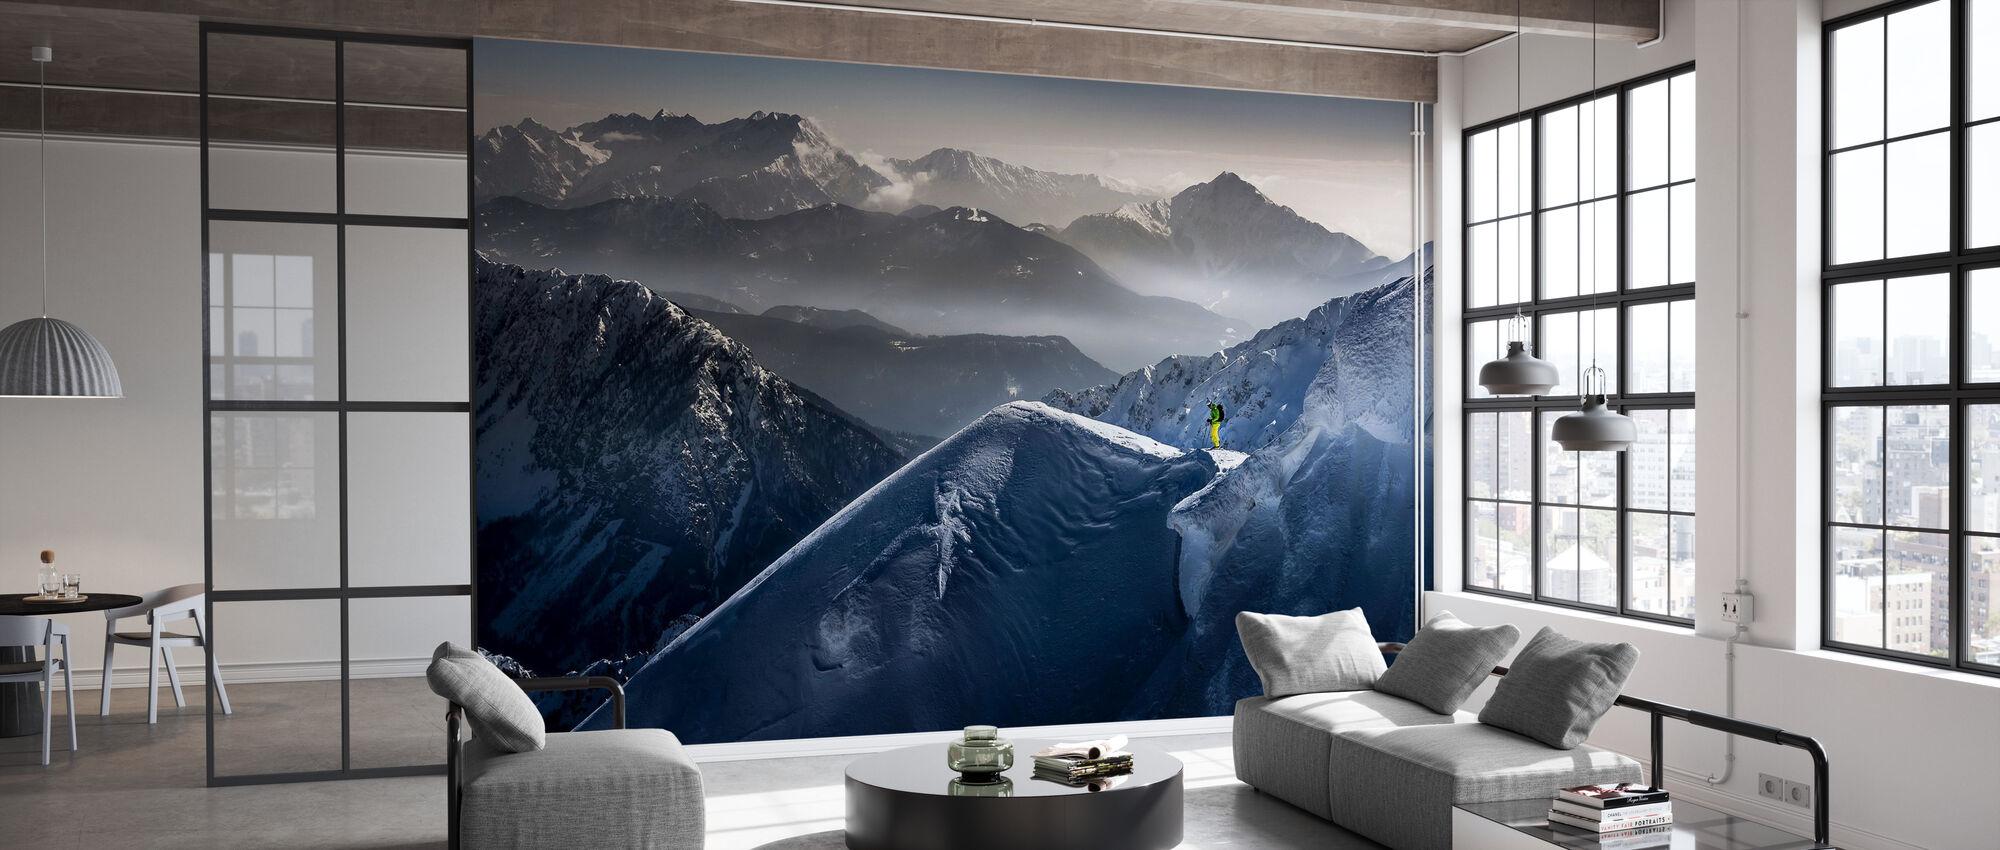 Skier on Mountain Top - Wallpaper - Office